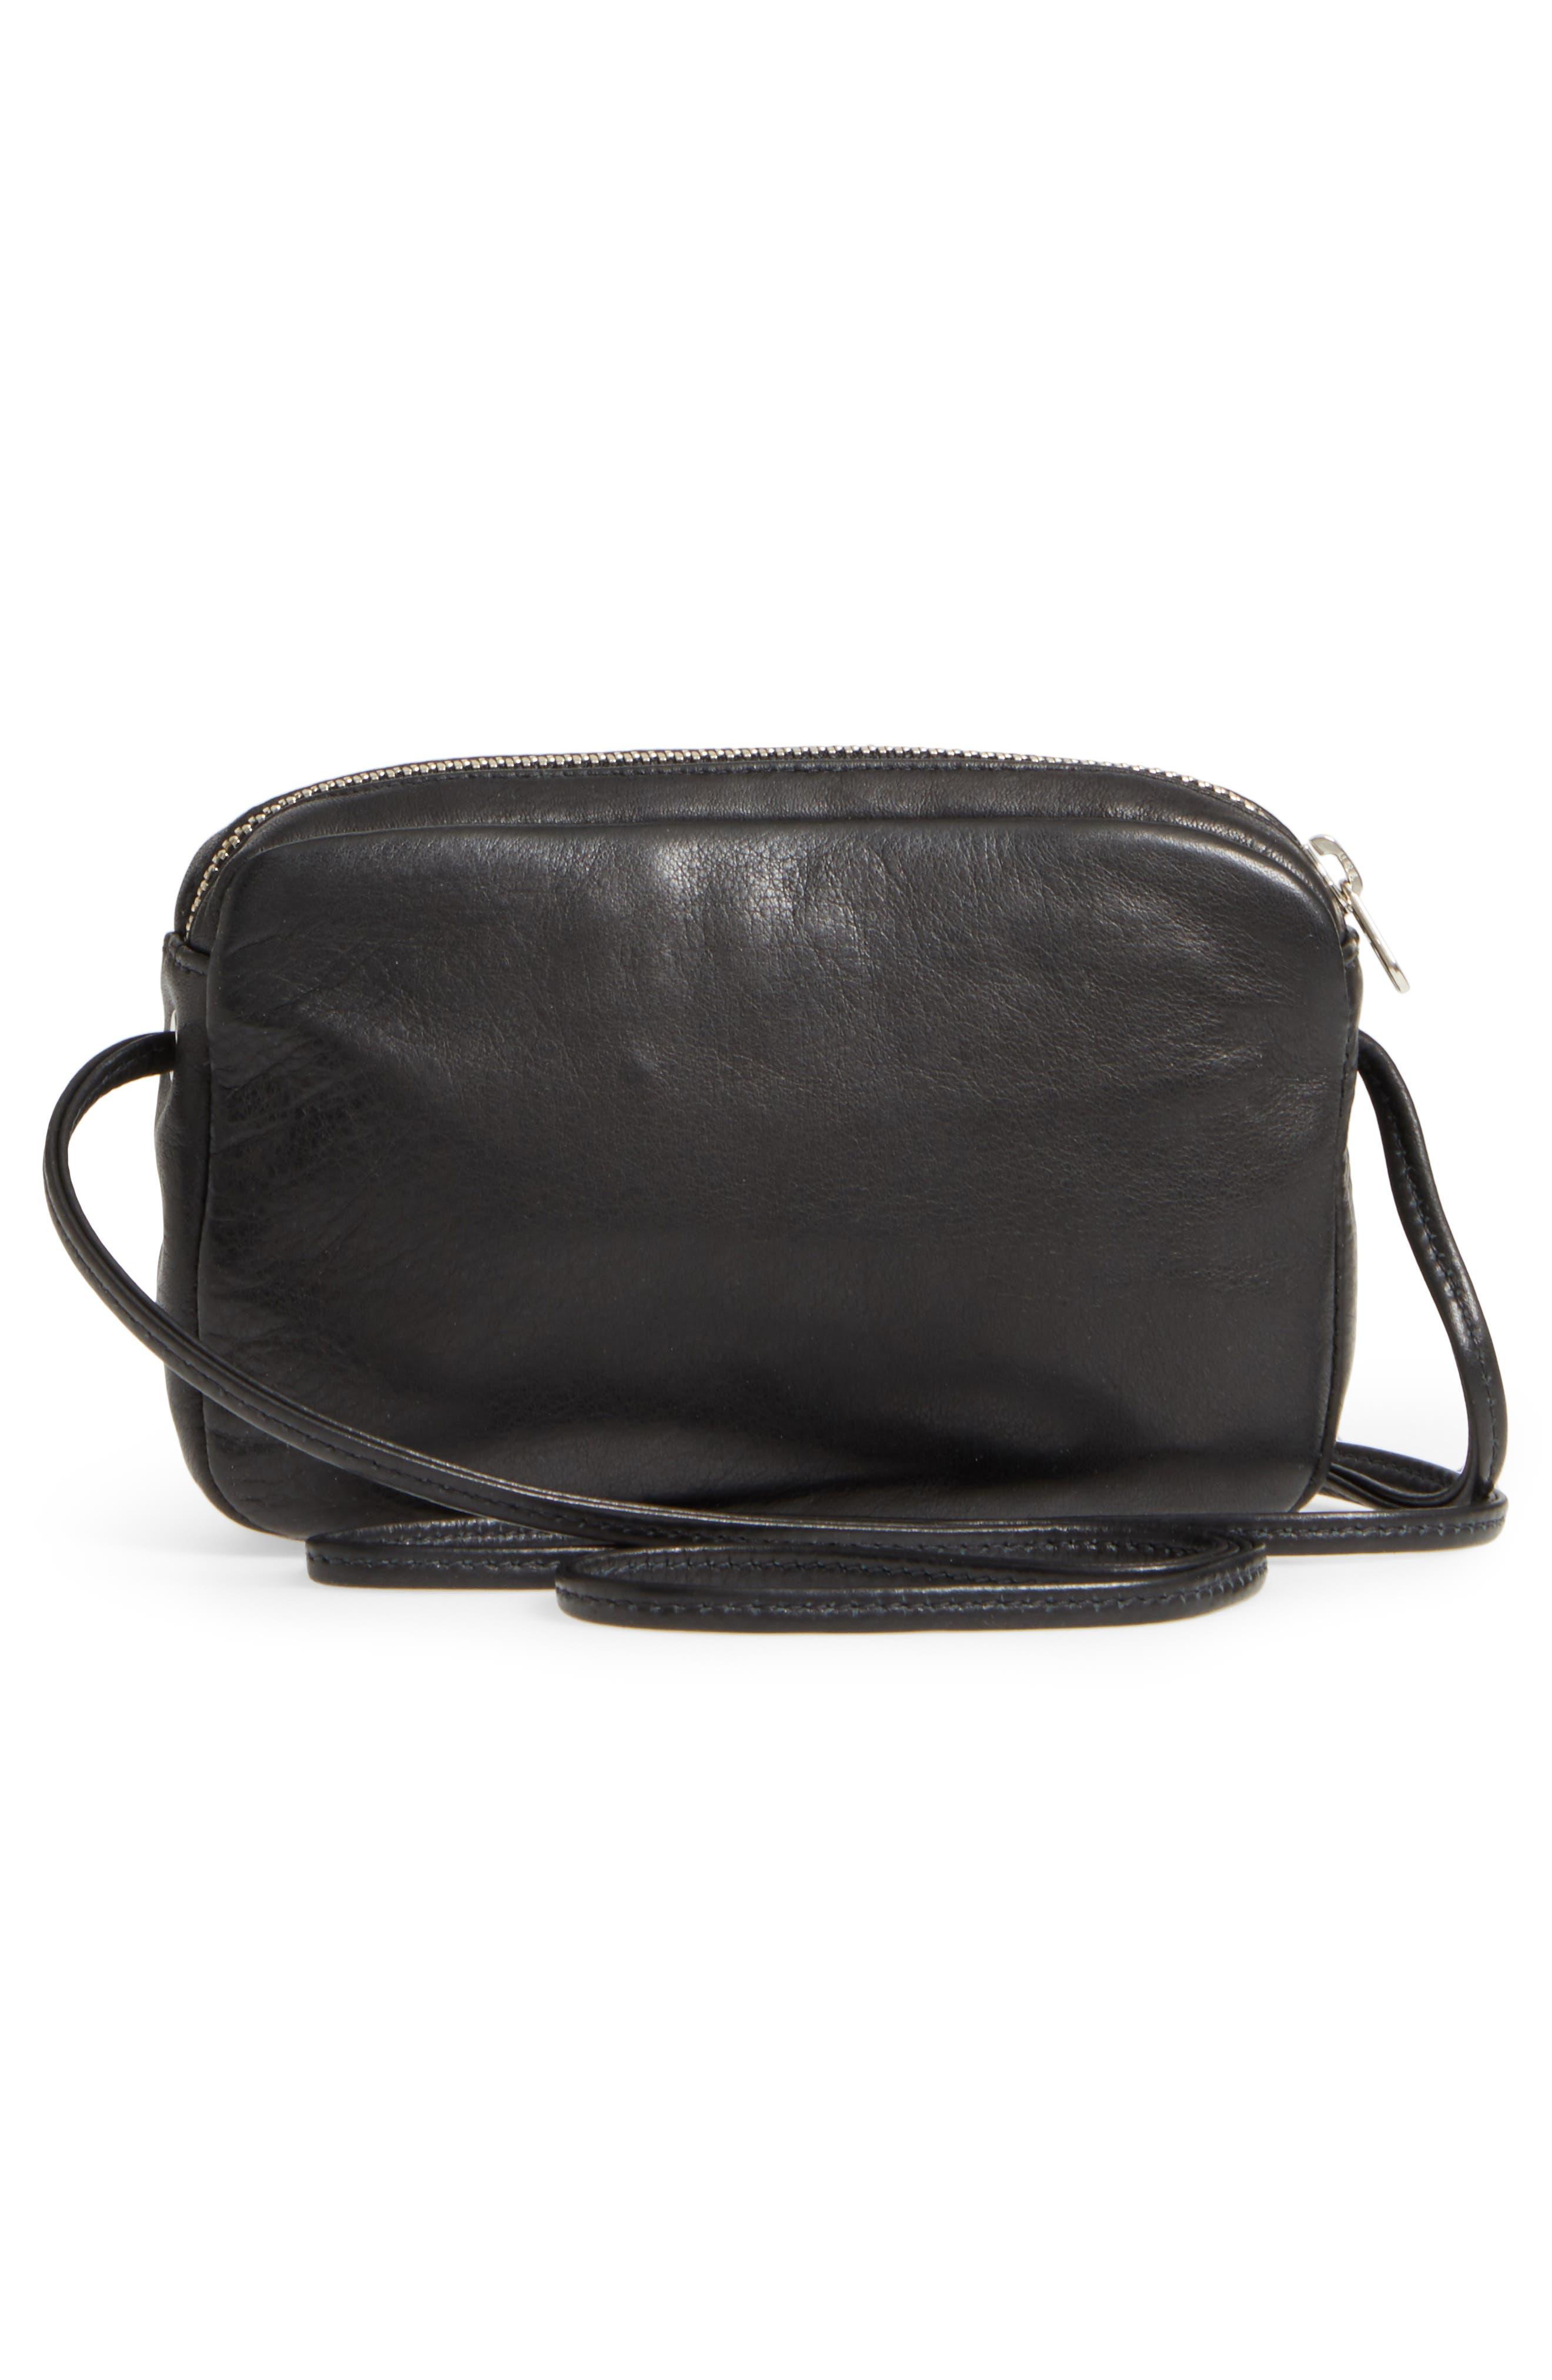 'Mini' Pebbled Leather Crossbody,                             Alternate thumbnail 3, color,                             005